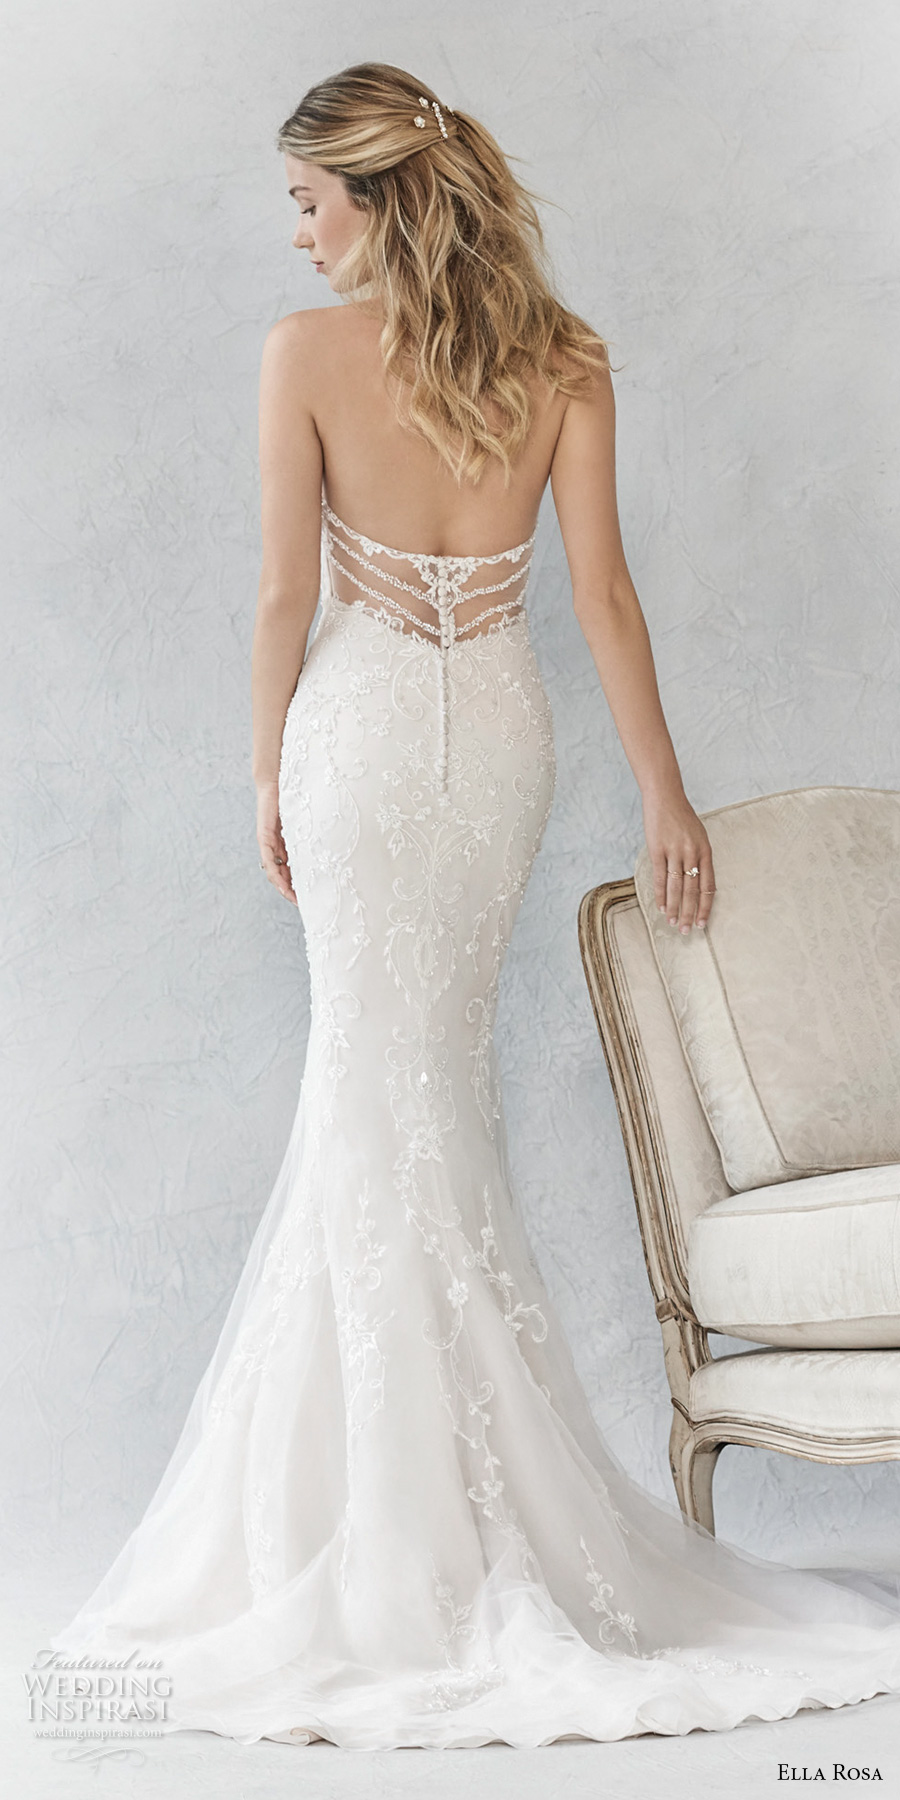 ella rosa spring 2017 bridal sleeveless embroidered strap sweetheart neckline full embellishment elegant fit and flare wedding dress  sweep train (362) bv